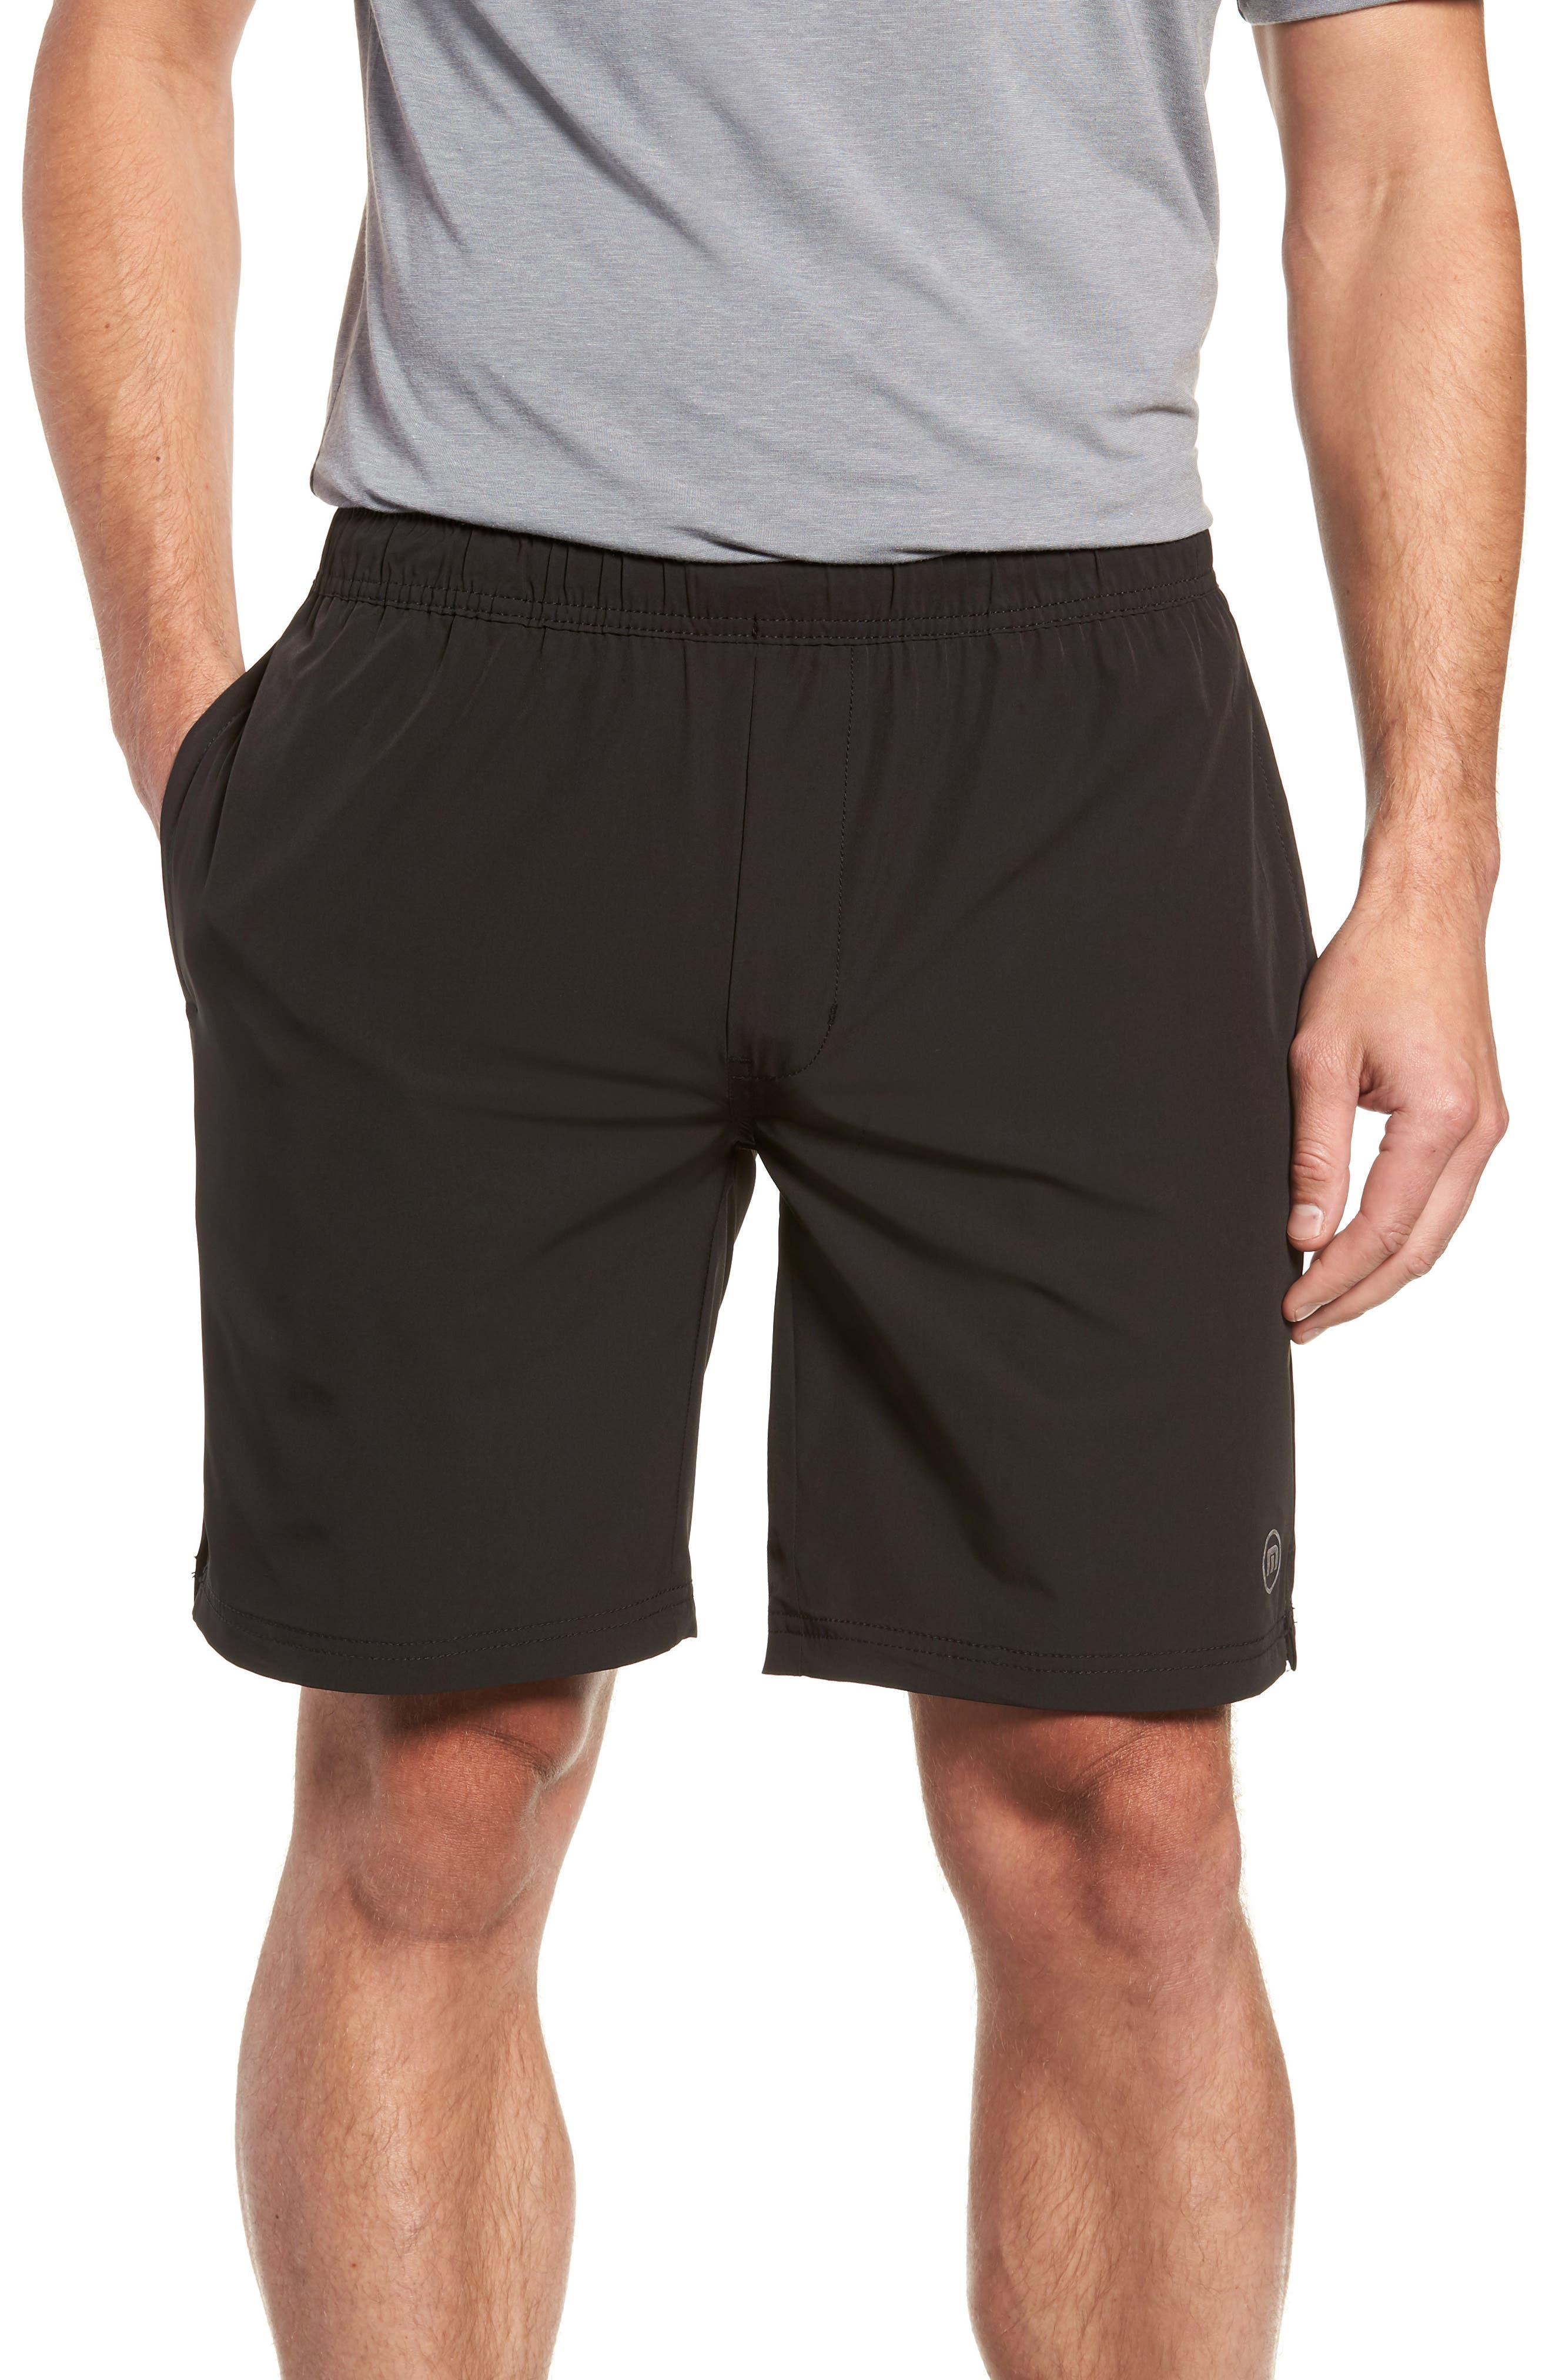 Deering Shorts,                         Main,                         color, BLACK